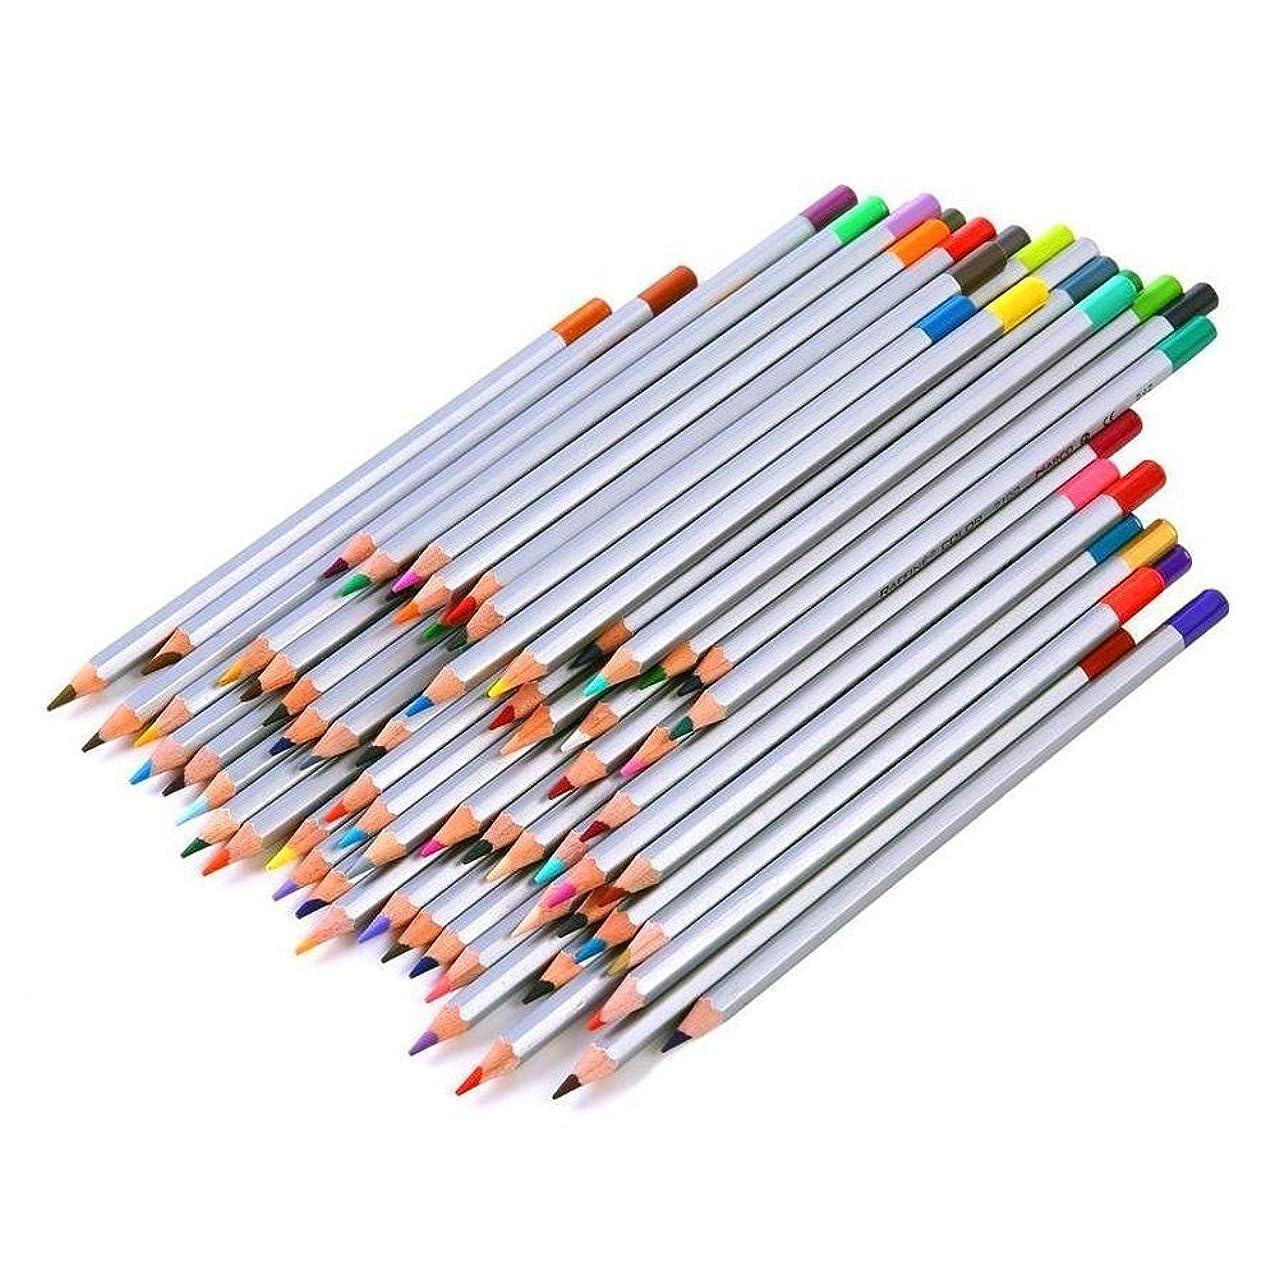 Bokit Art Colored Pencils/ Drawing Pencils for Artist Sketch / Secret Garden Coloring Book (72 Colors)